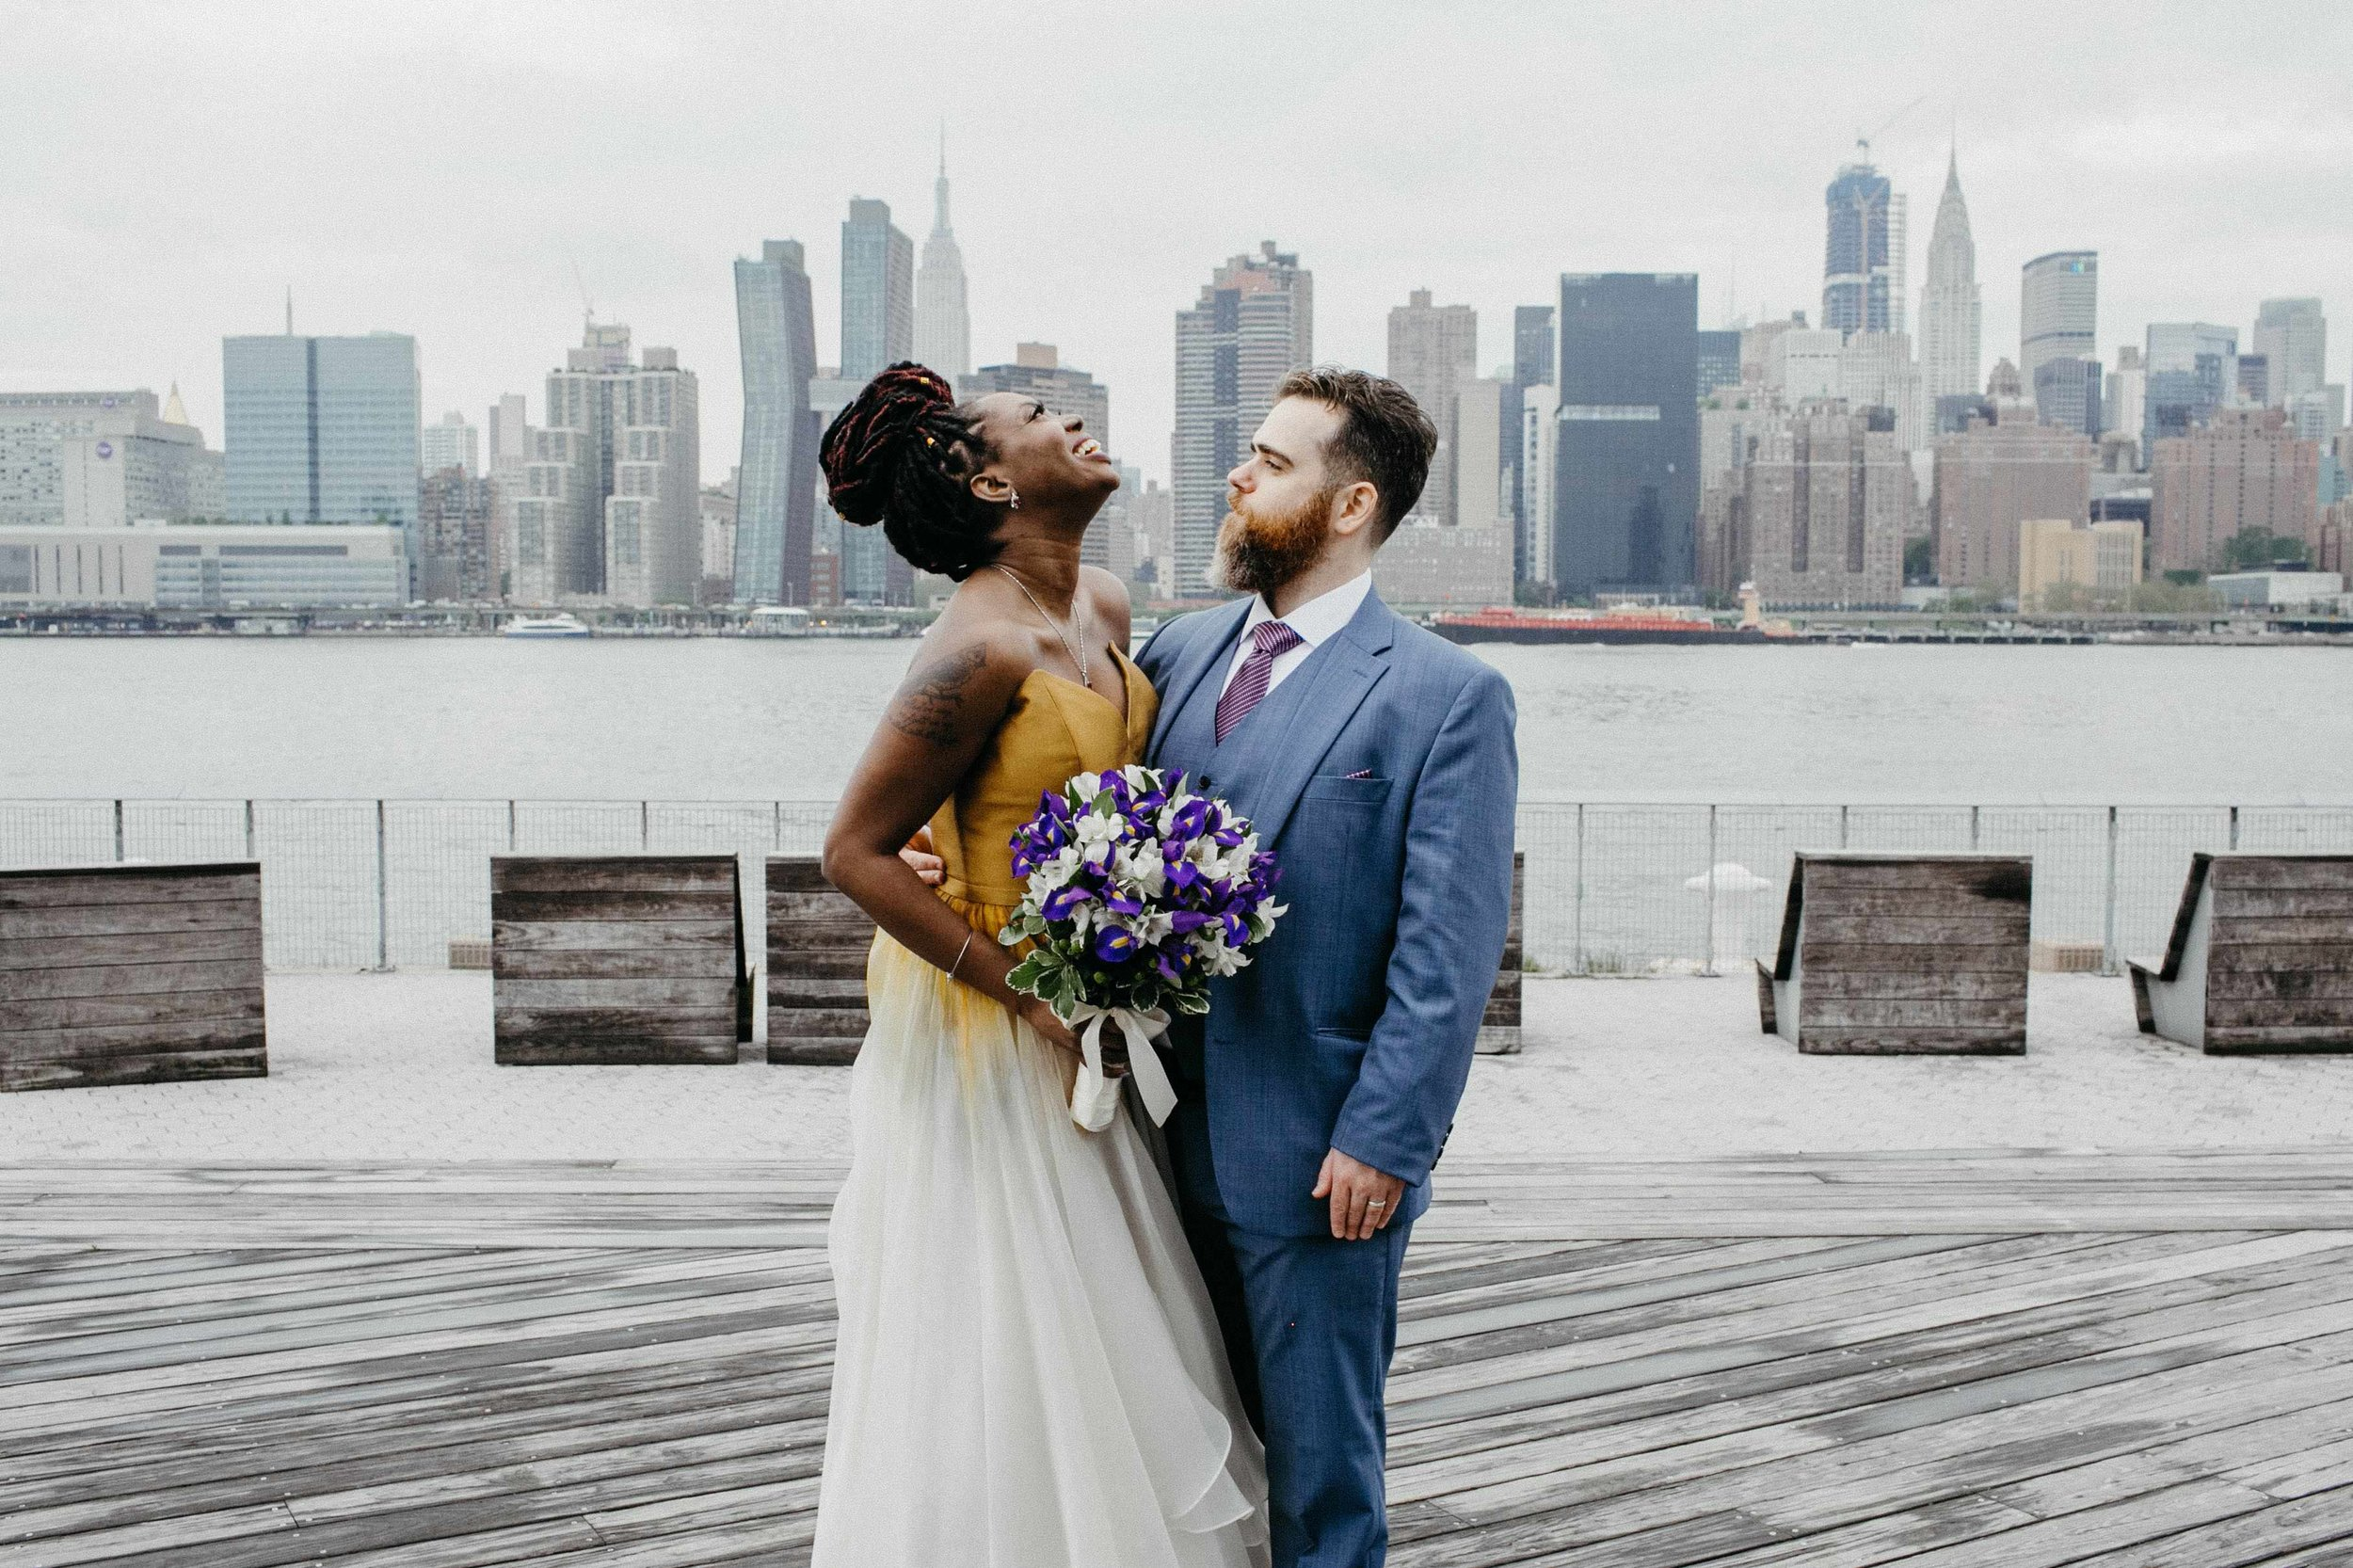 Sevlynn-Photography-Wedding-LIC-Landing-Maiella-NYC-49.jpg